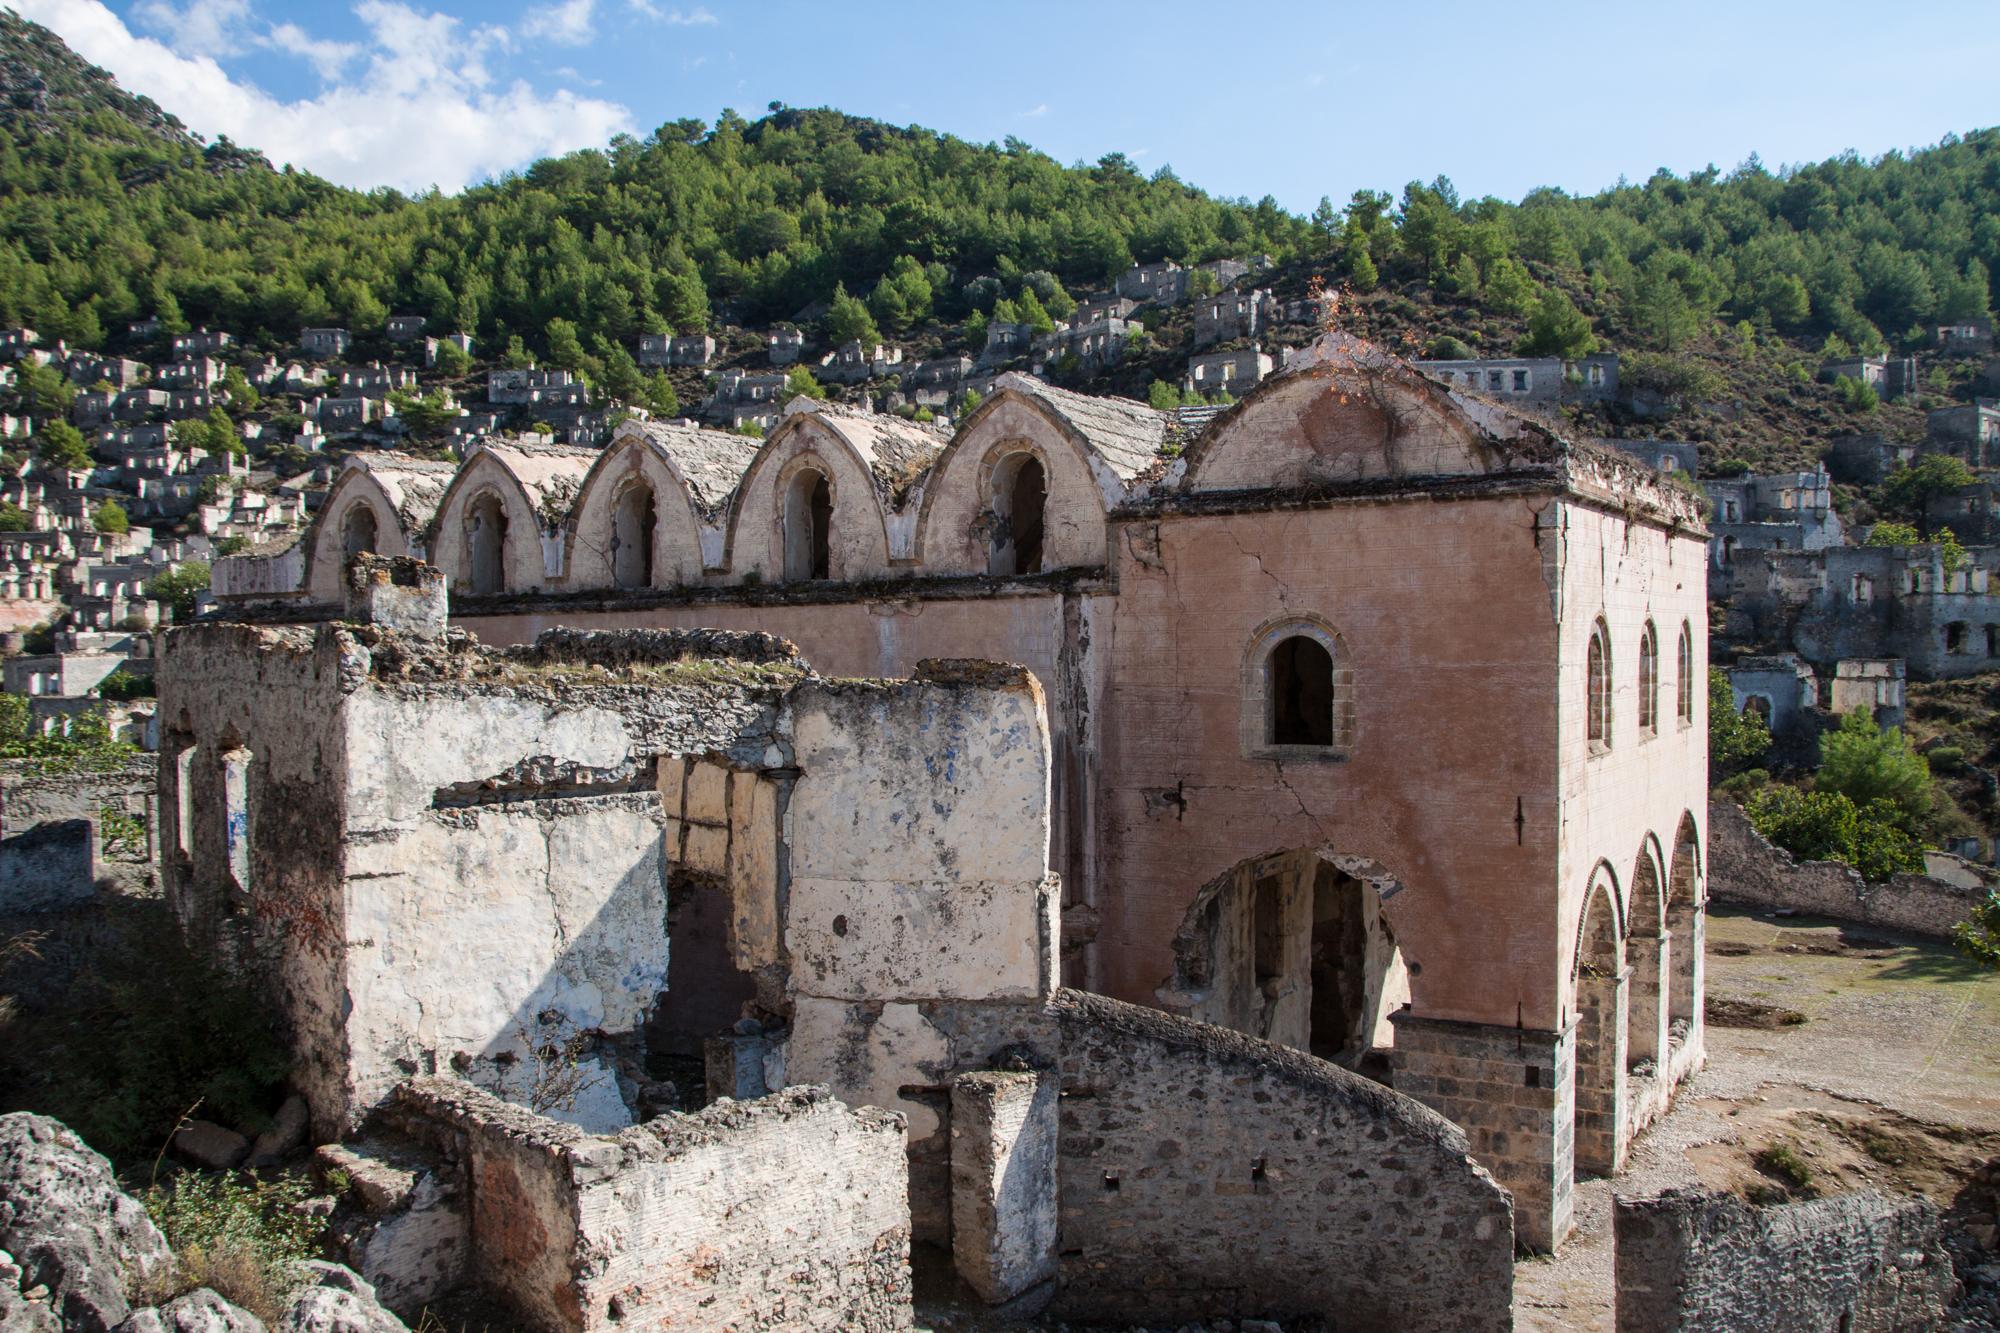 The abandoned city of Kayaköy